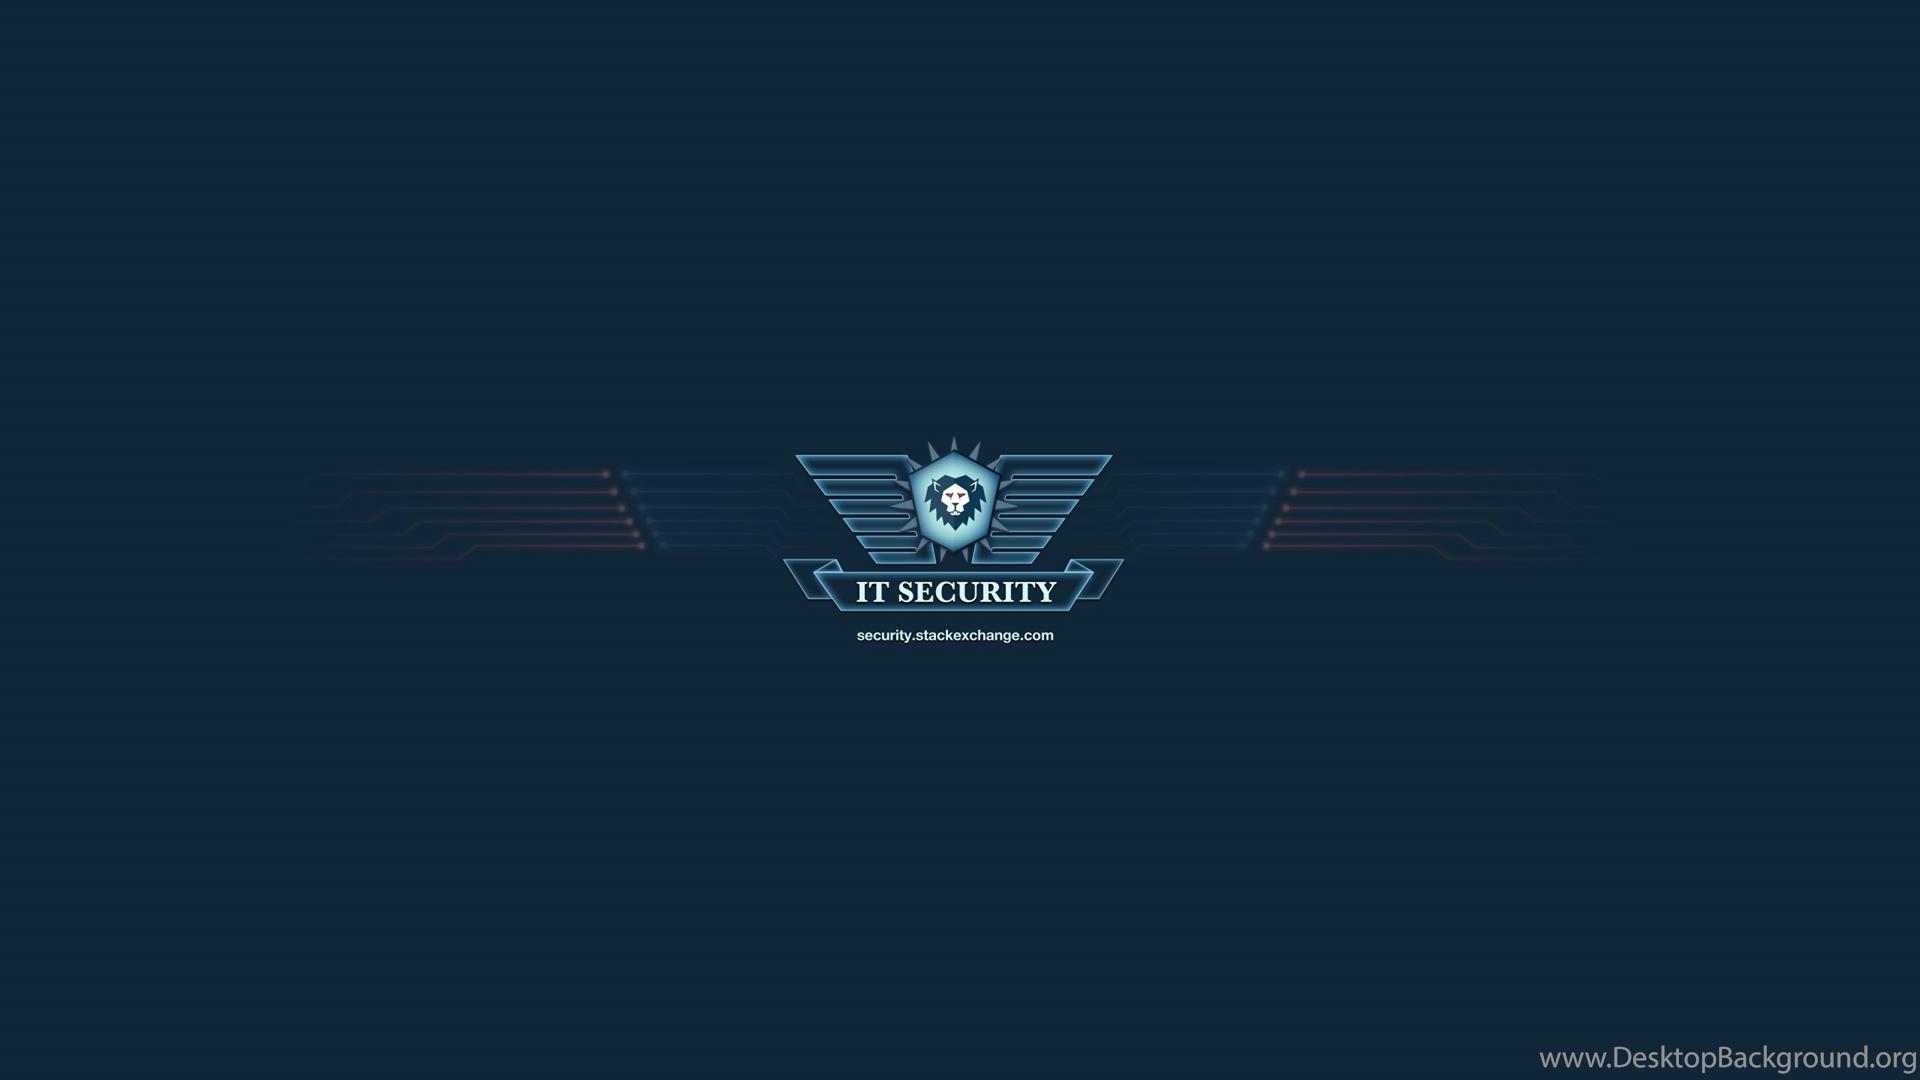 IT Security SE Logo Wallpapers Information Meta Stack